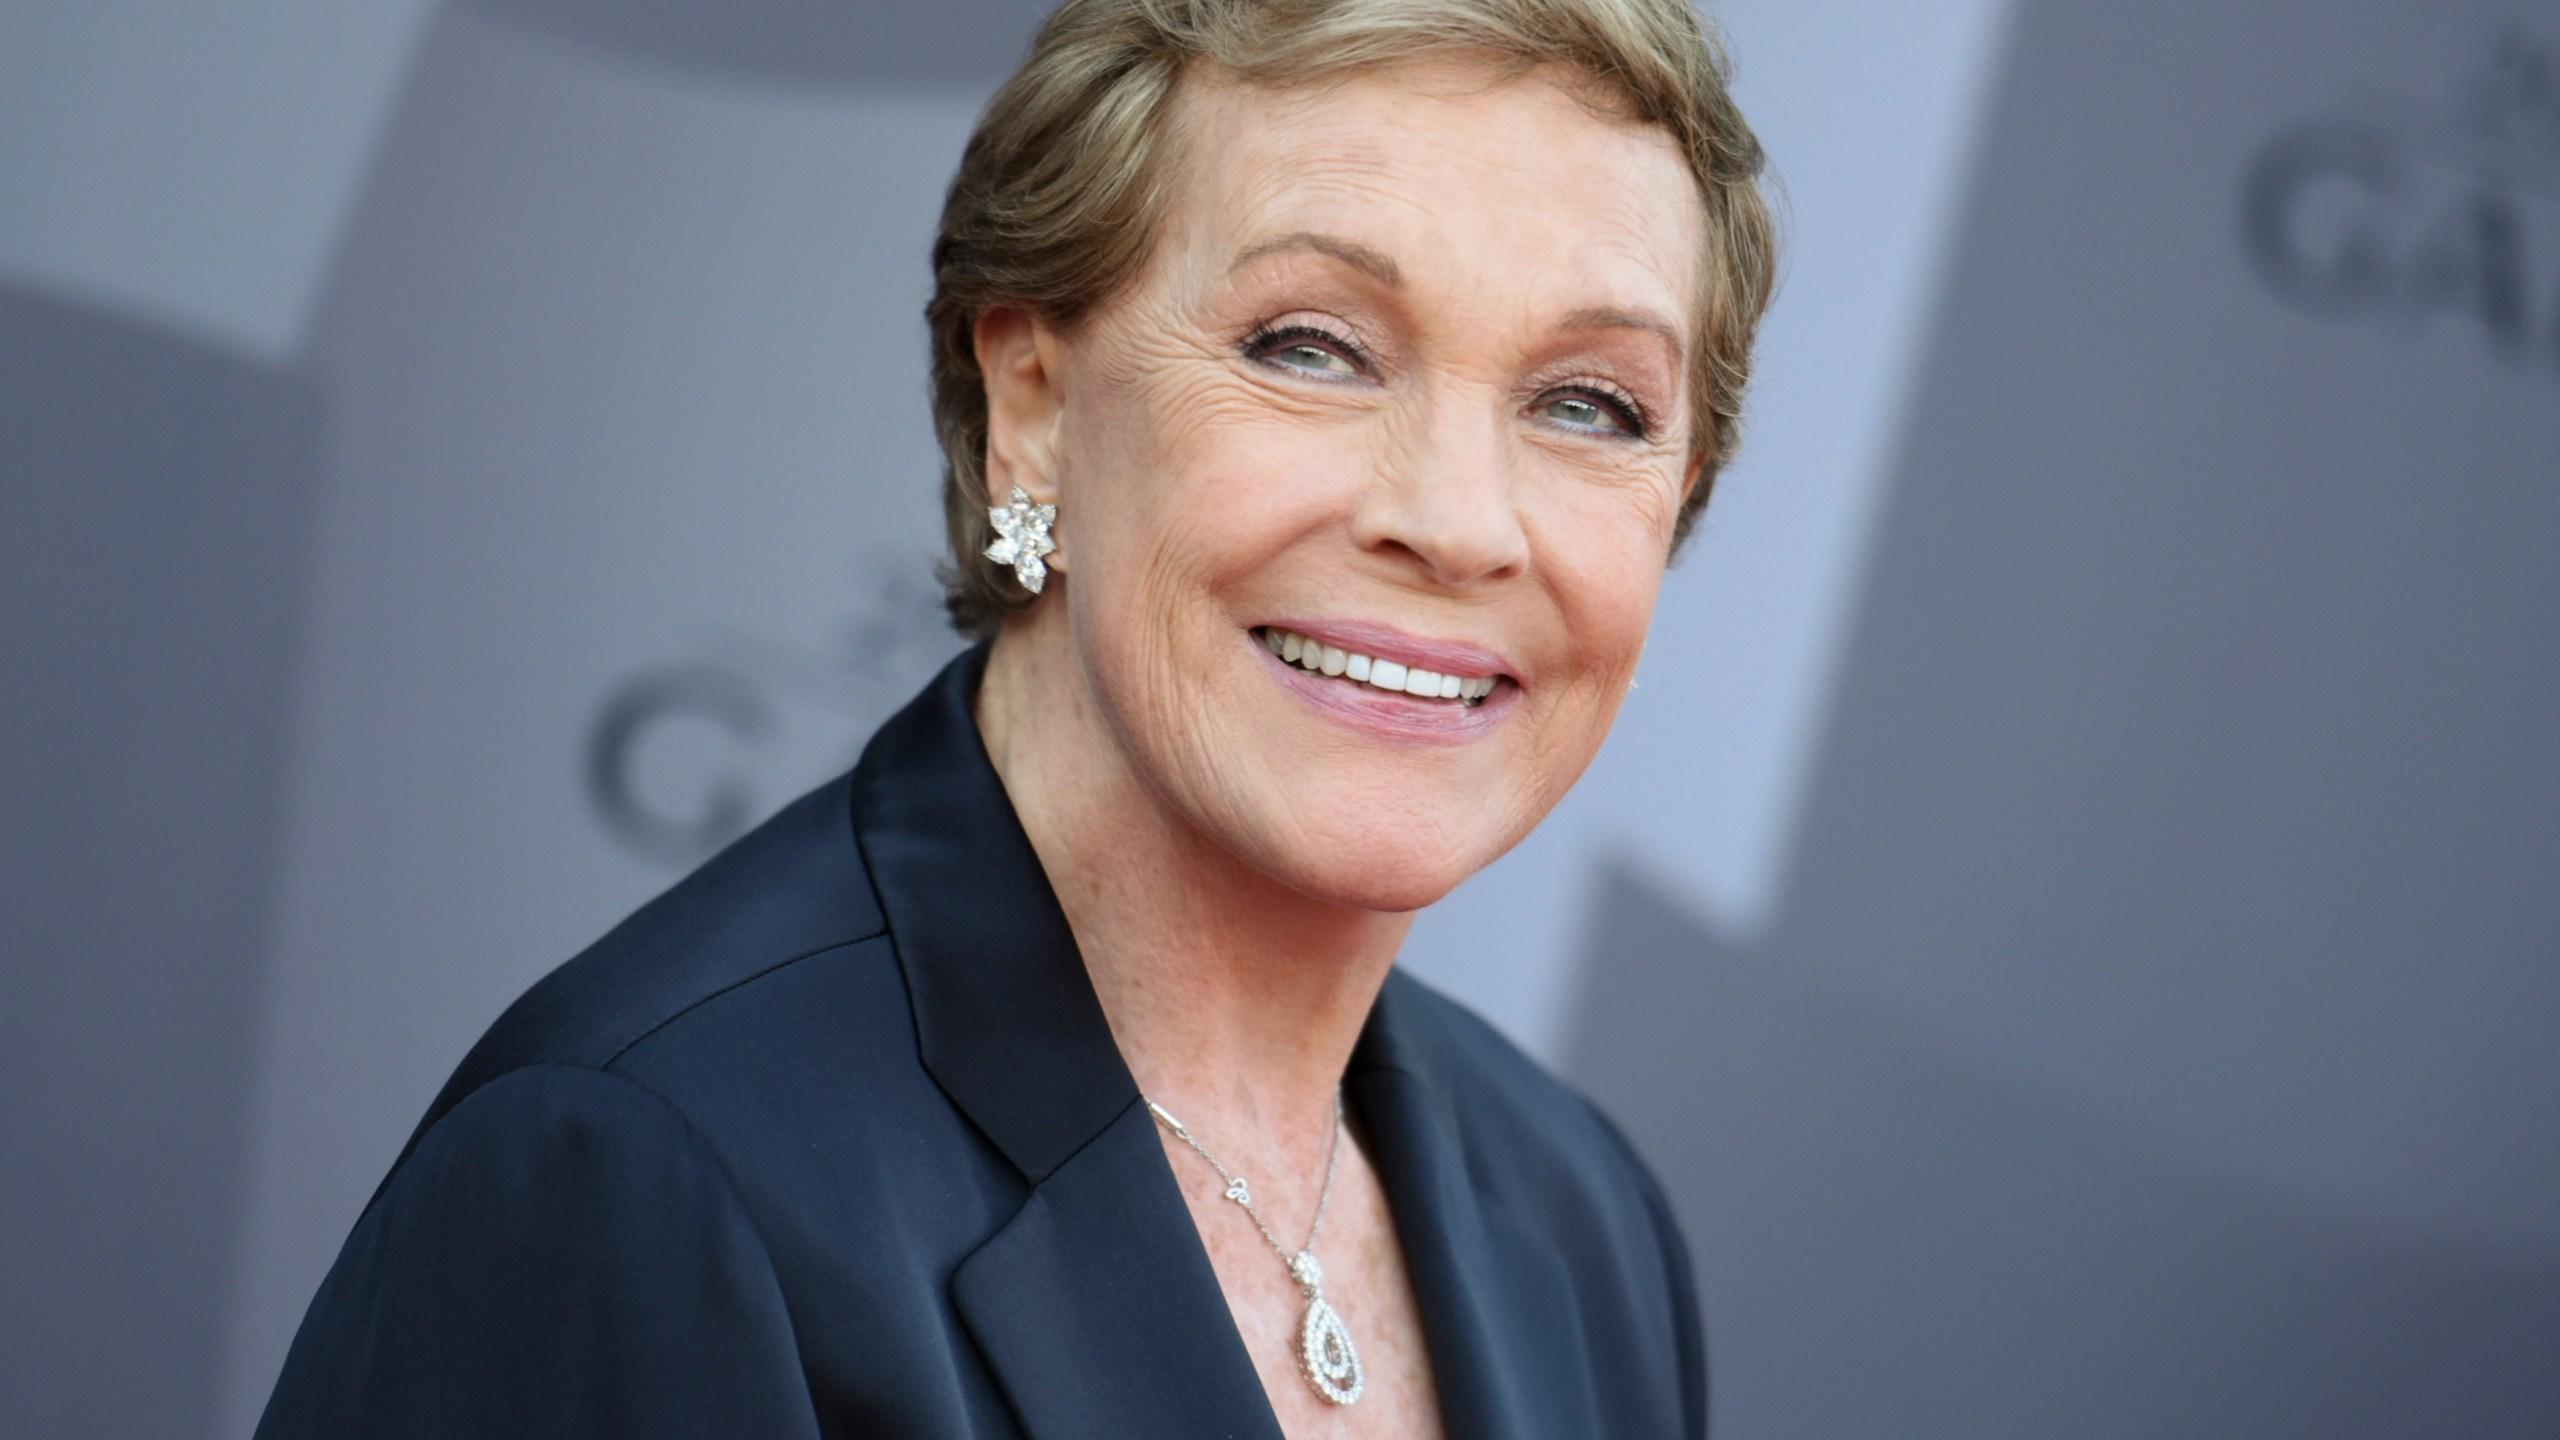 American Film Institute postponing gala with Julie Andrews | ABC27